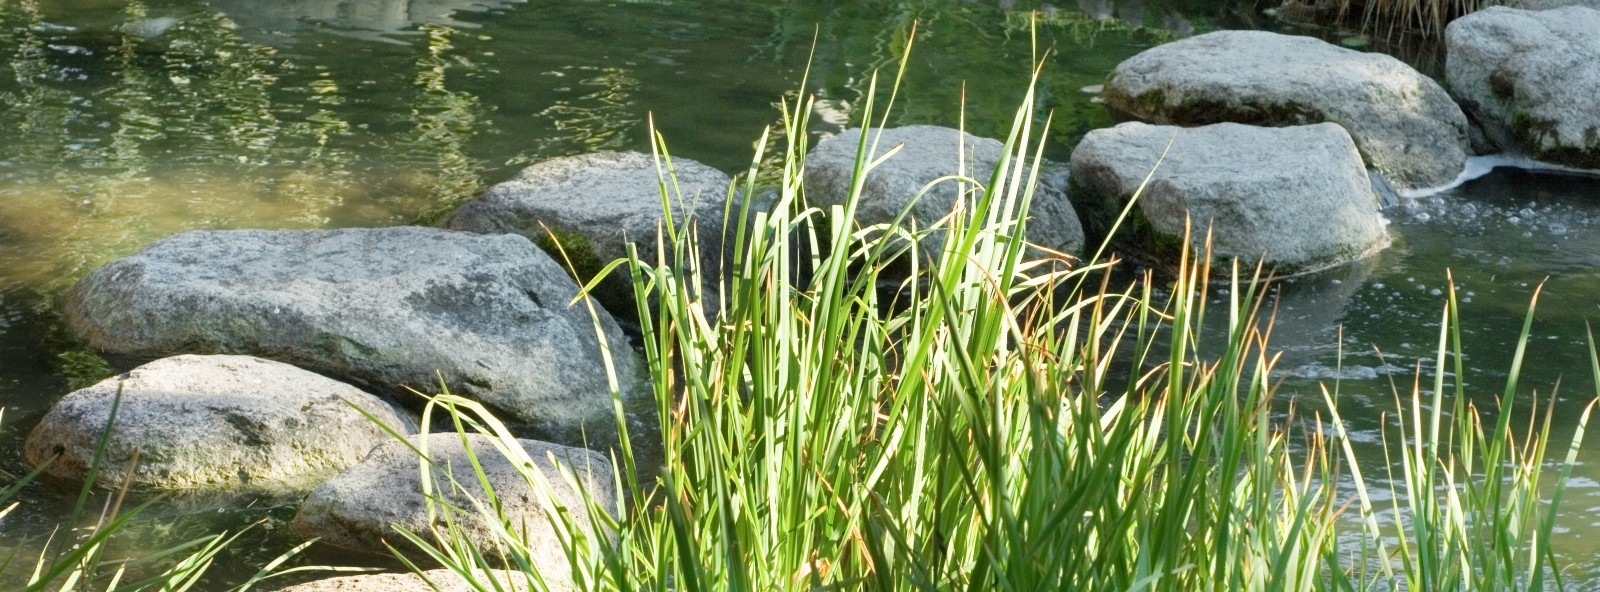 Stepping stones through stream